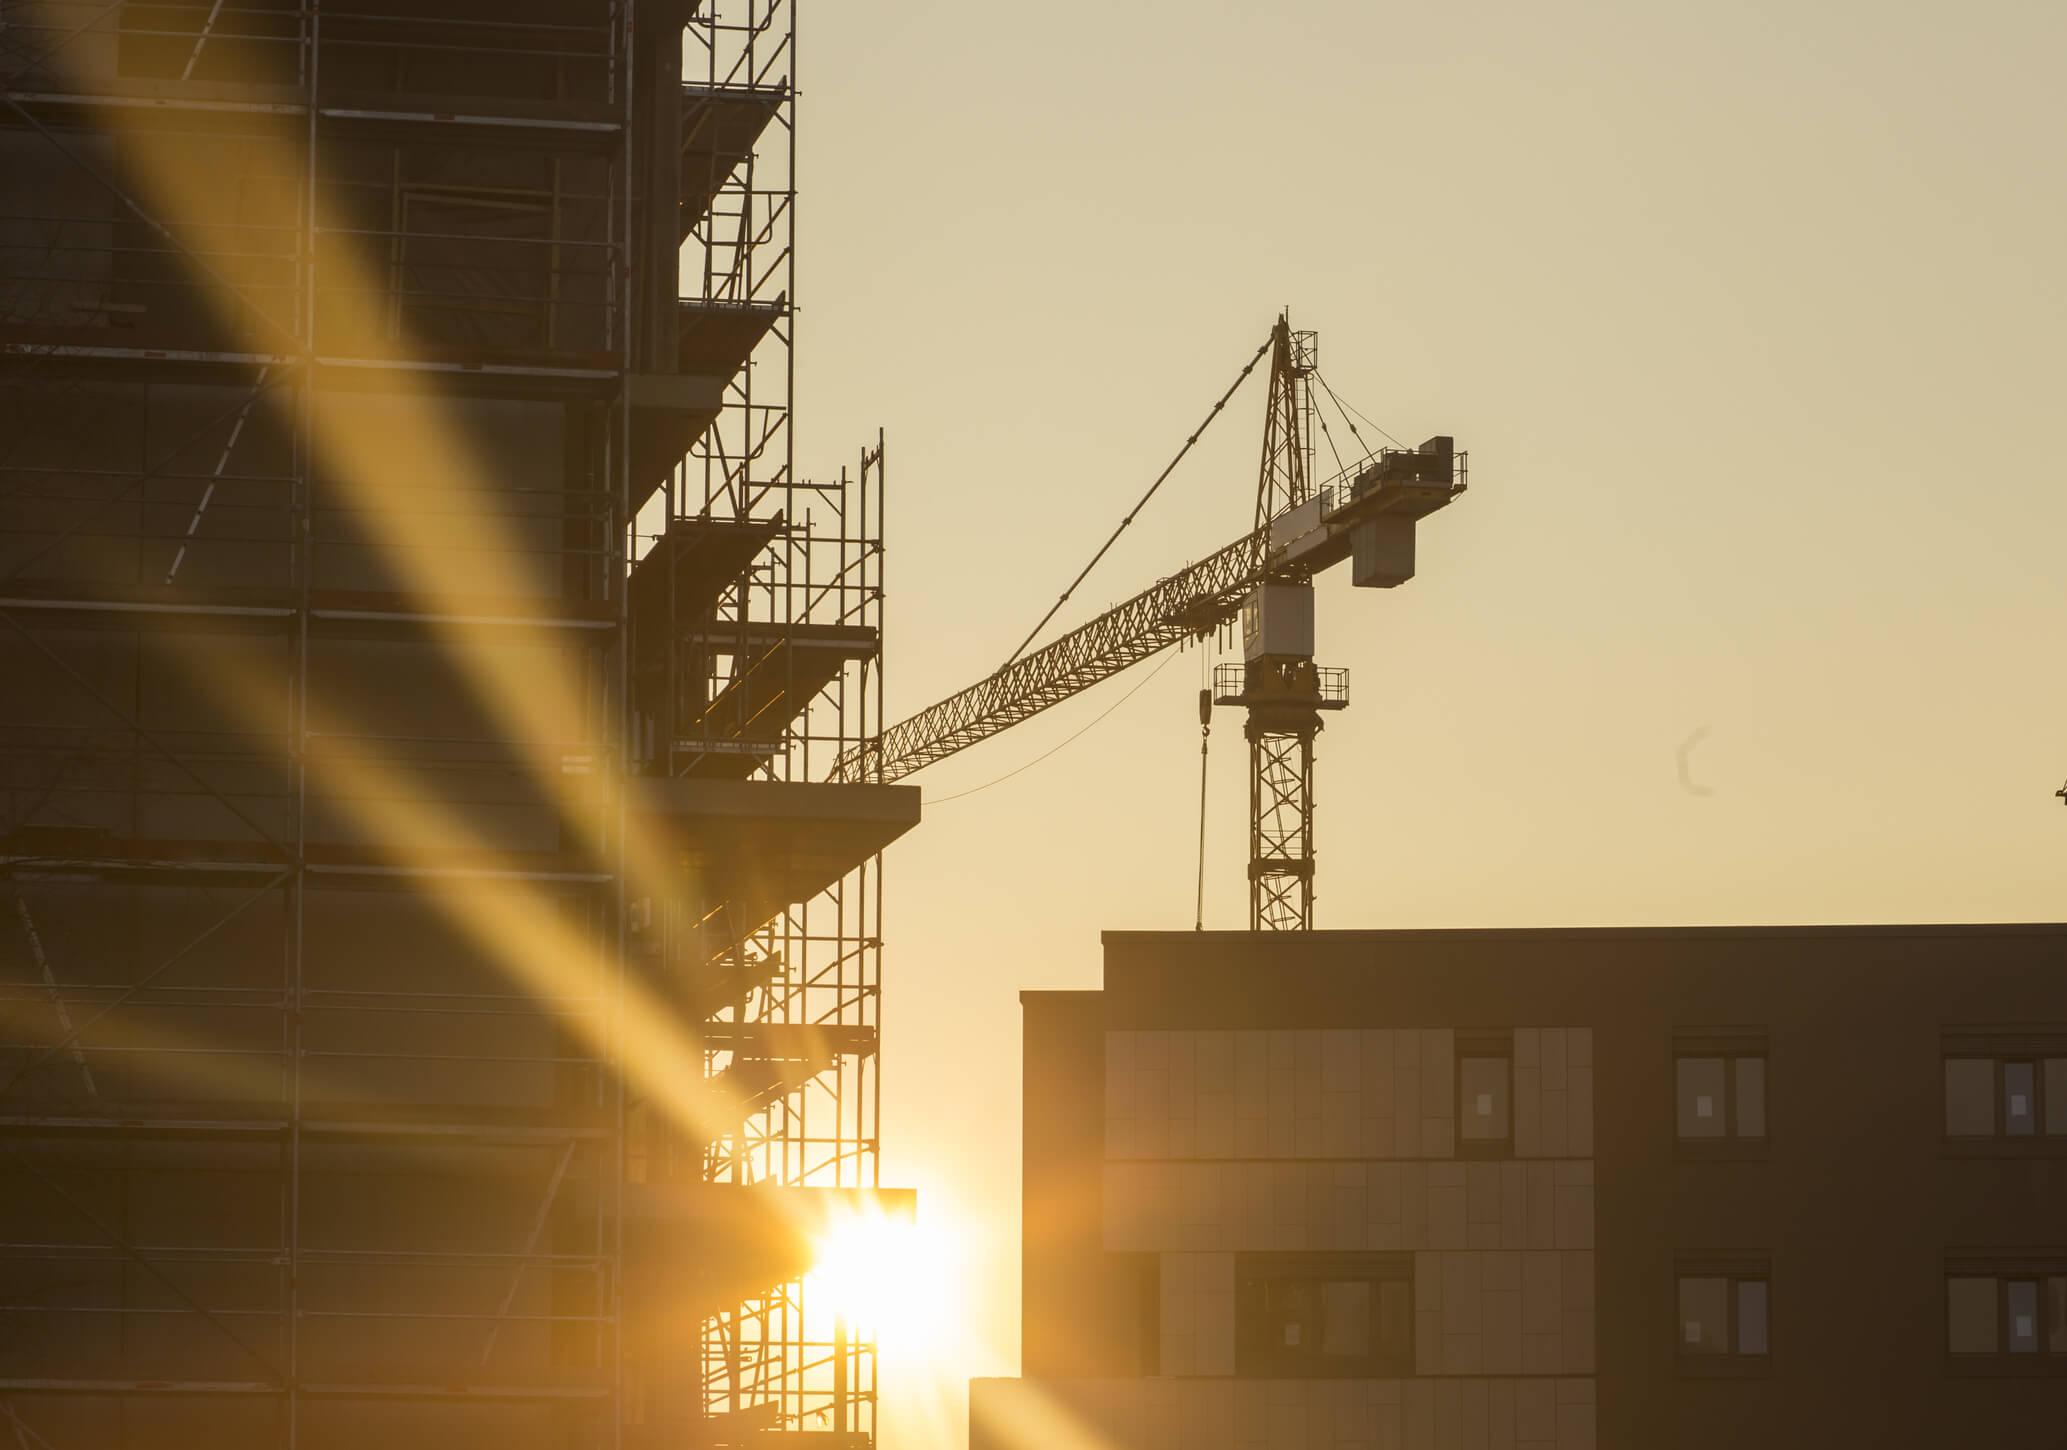 Crane in construction site.